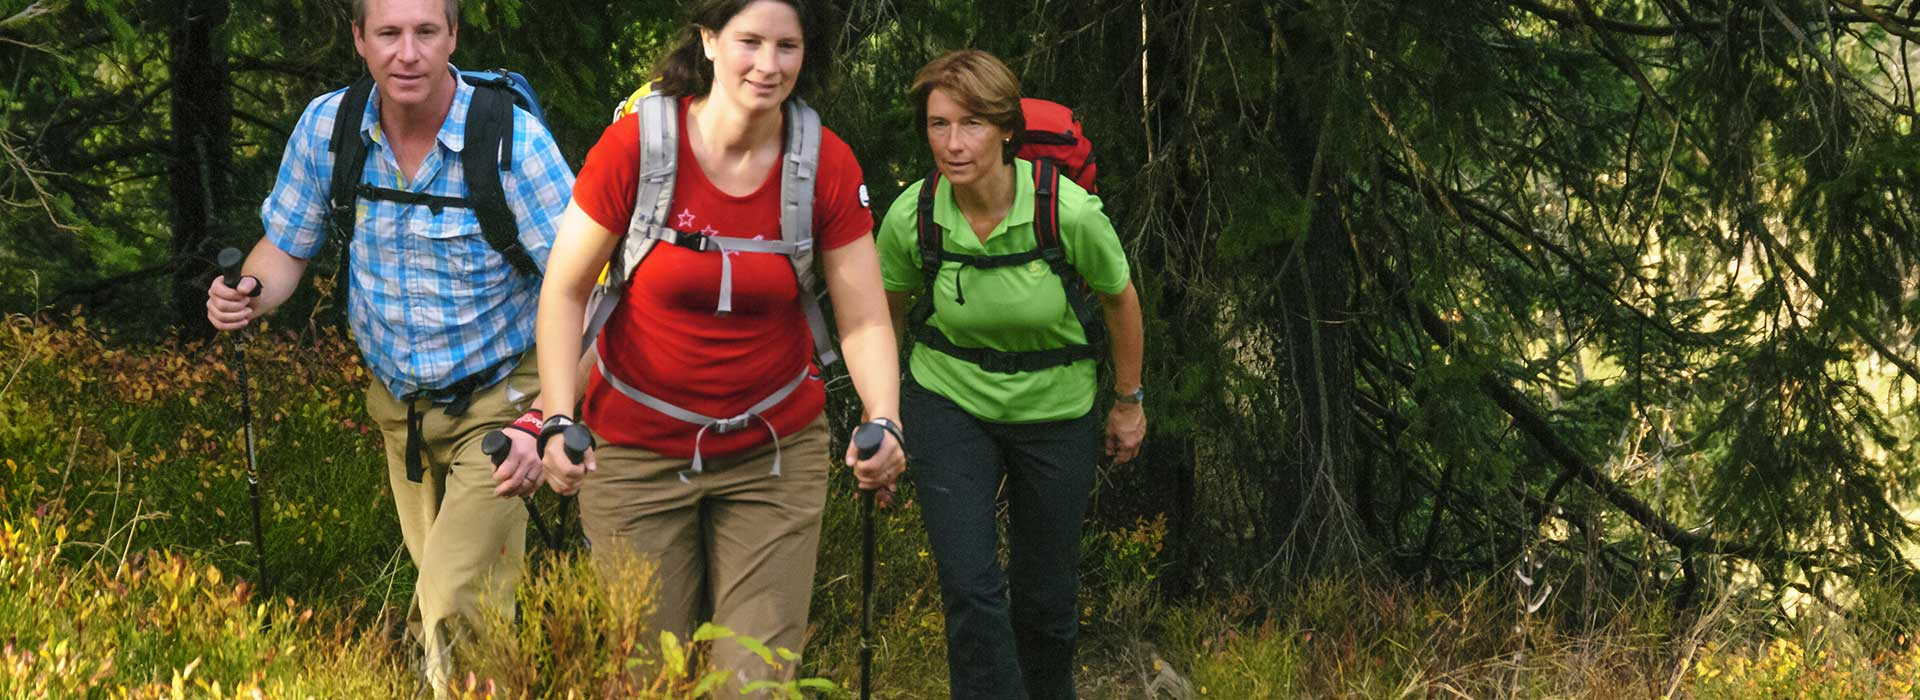 Wandergruppe bei einer Gruppenreise im Wald | © ARochau - fotolia.com